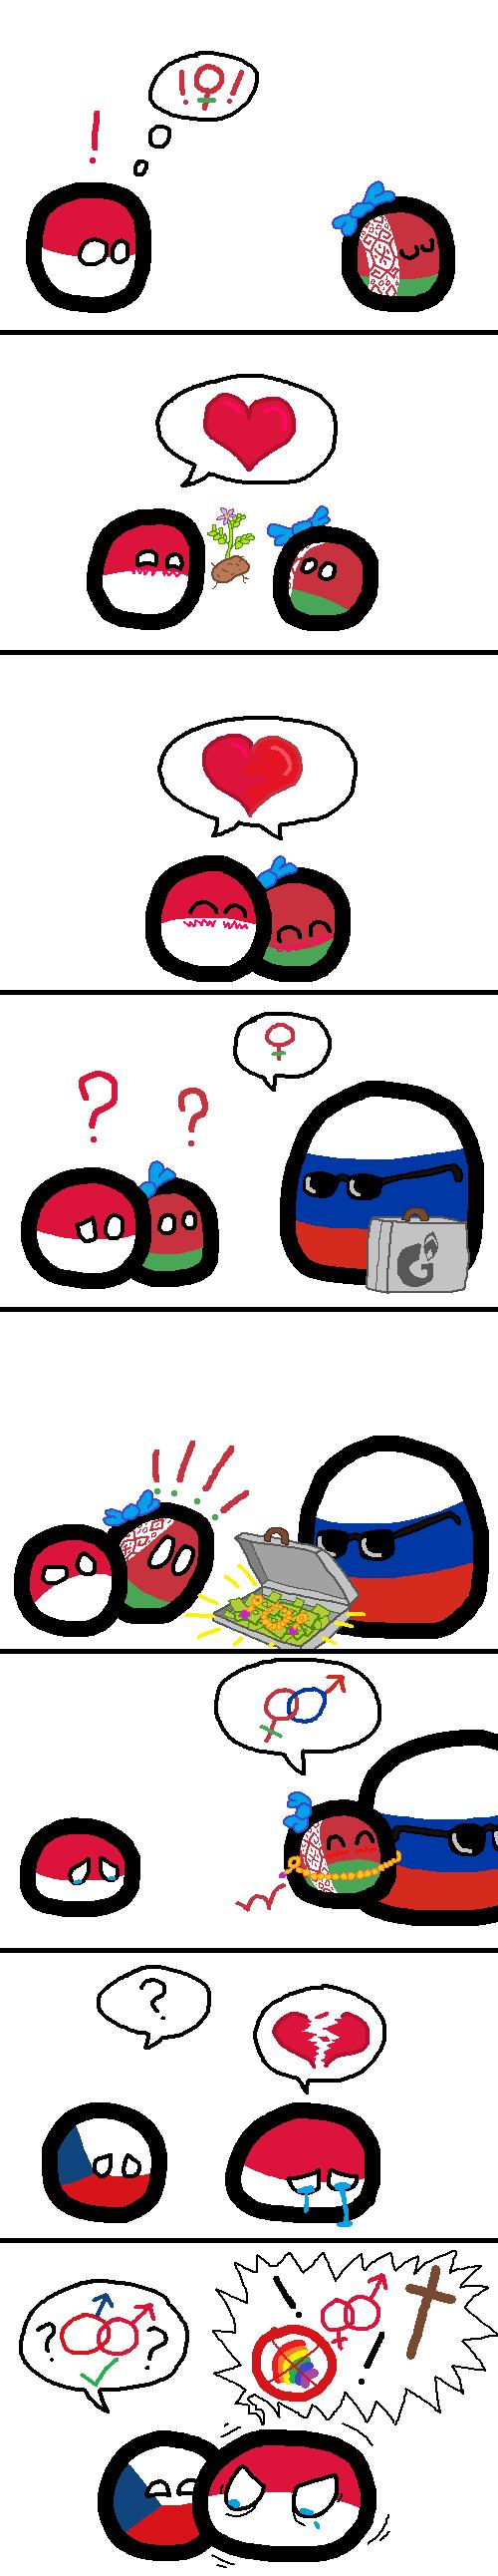 Countryballs Belarus Not Belorussia Map Noideaanimation